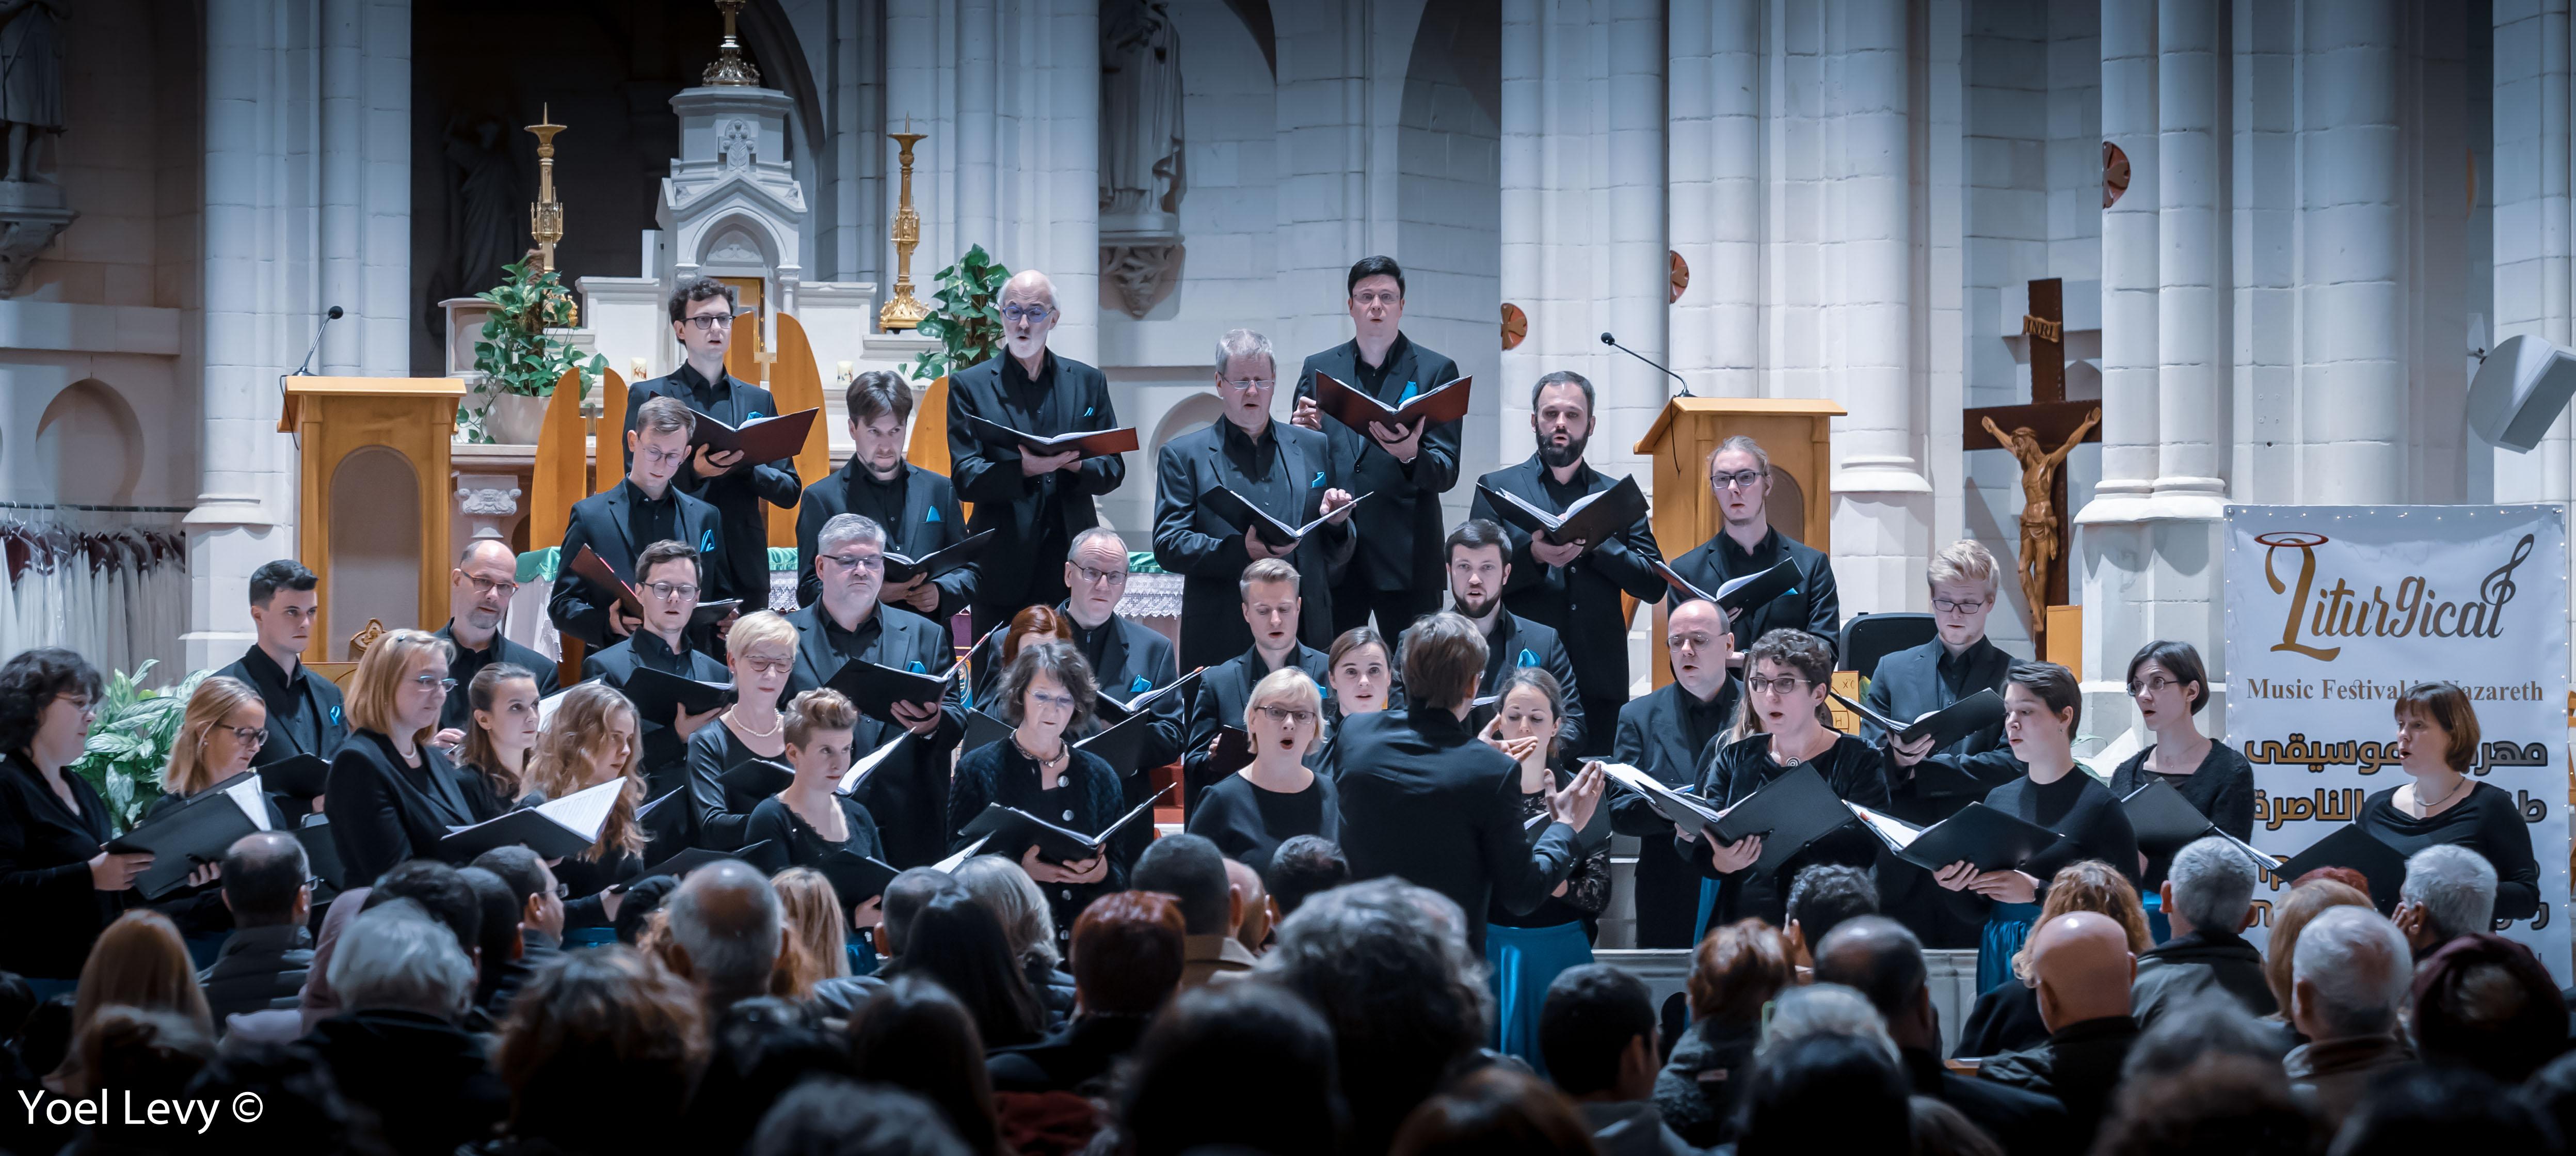 Second Annual Liturgical Festival, Nazareth 2020